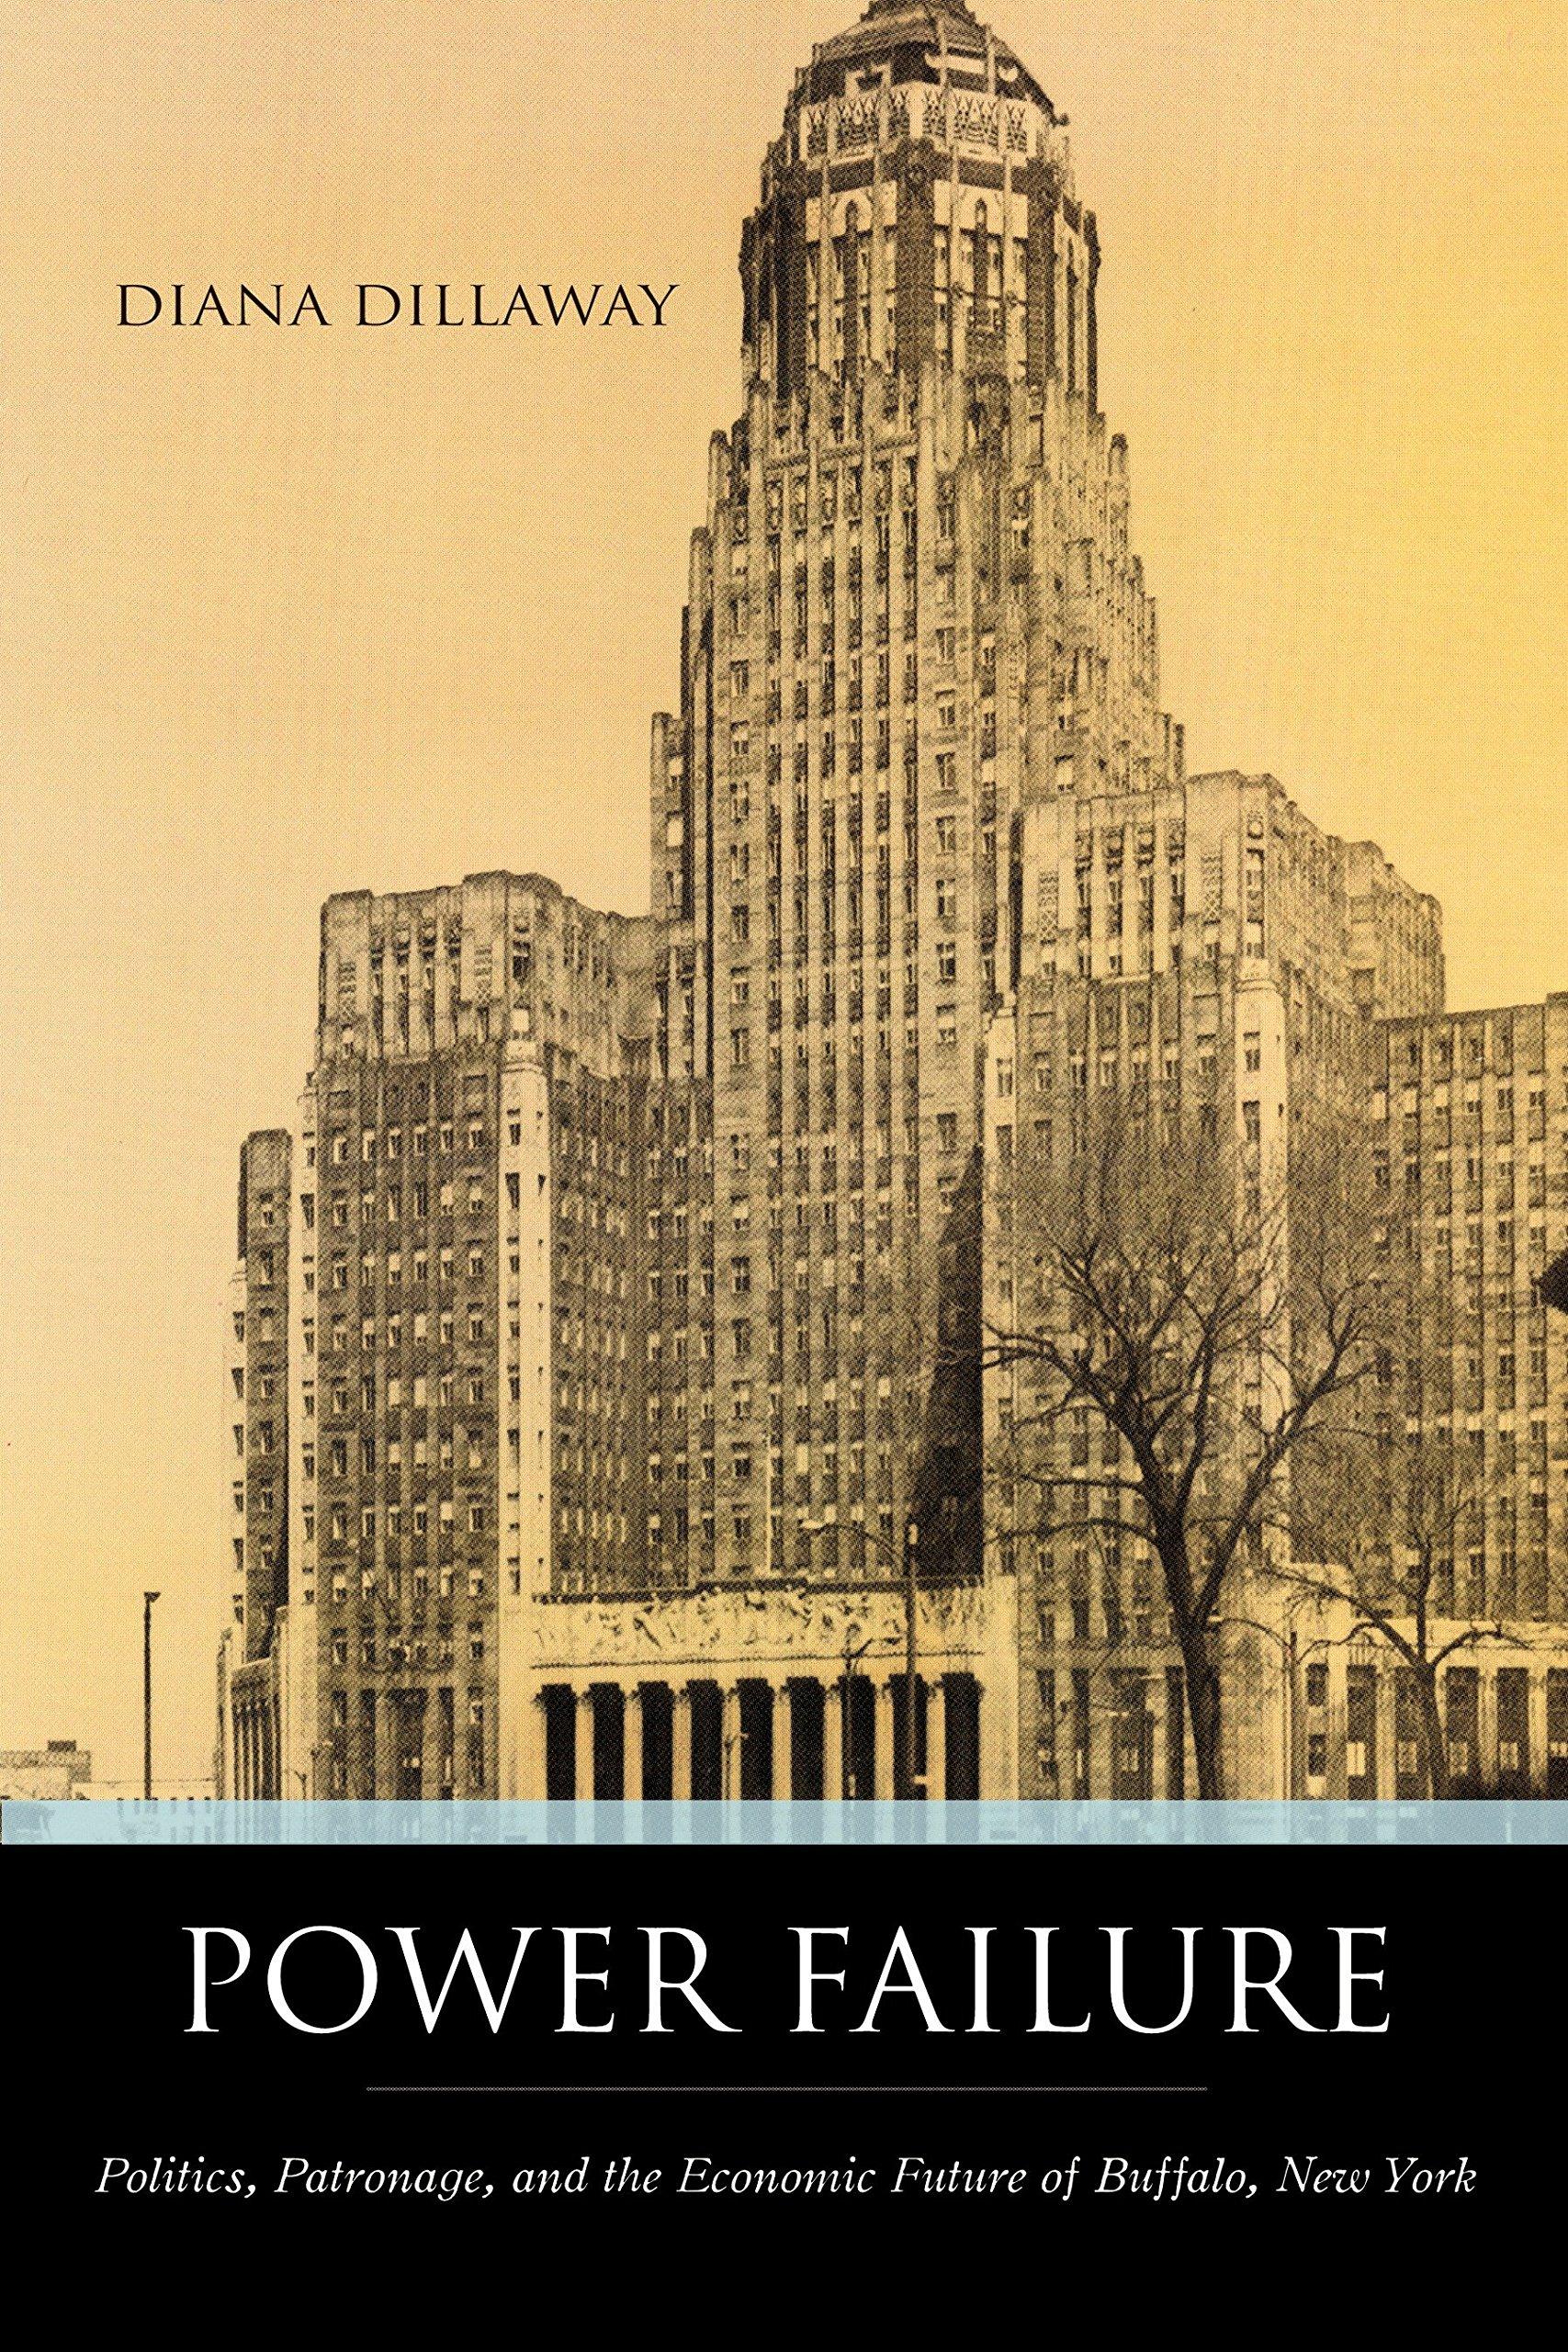 Download Power Failure: Politics, Patronage, And the Economic Future of Buffalo, New York PDF